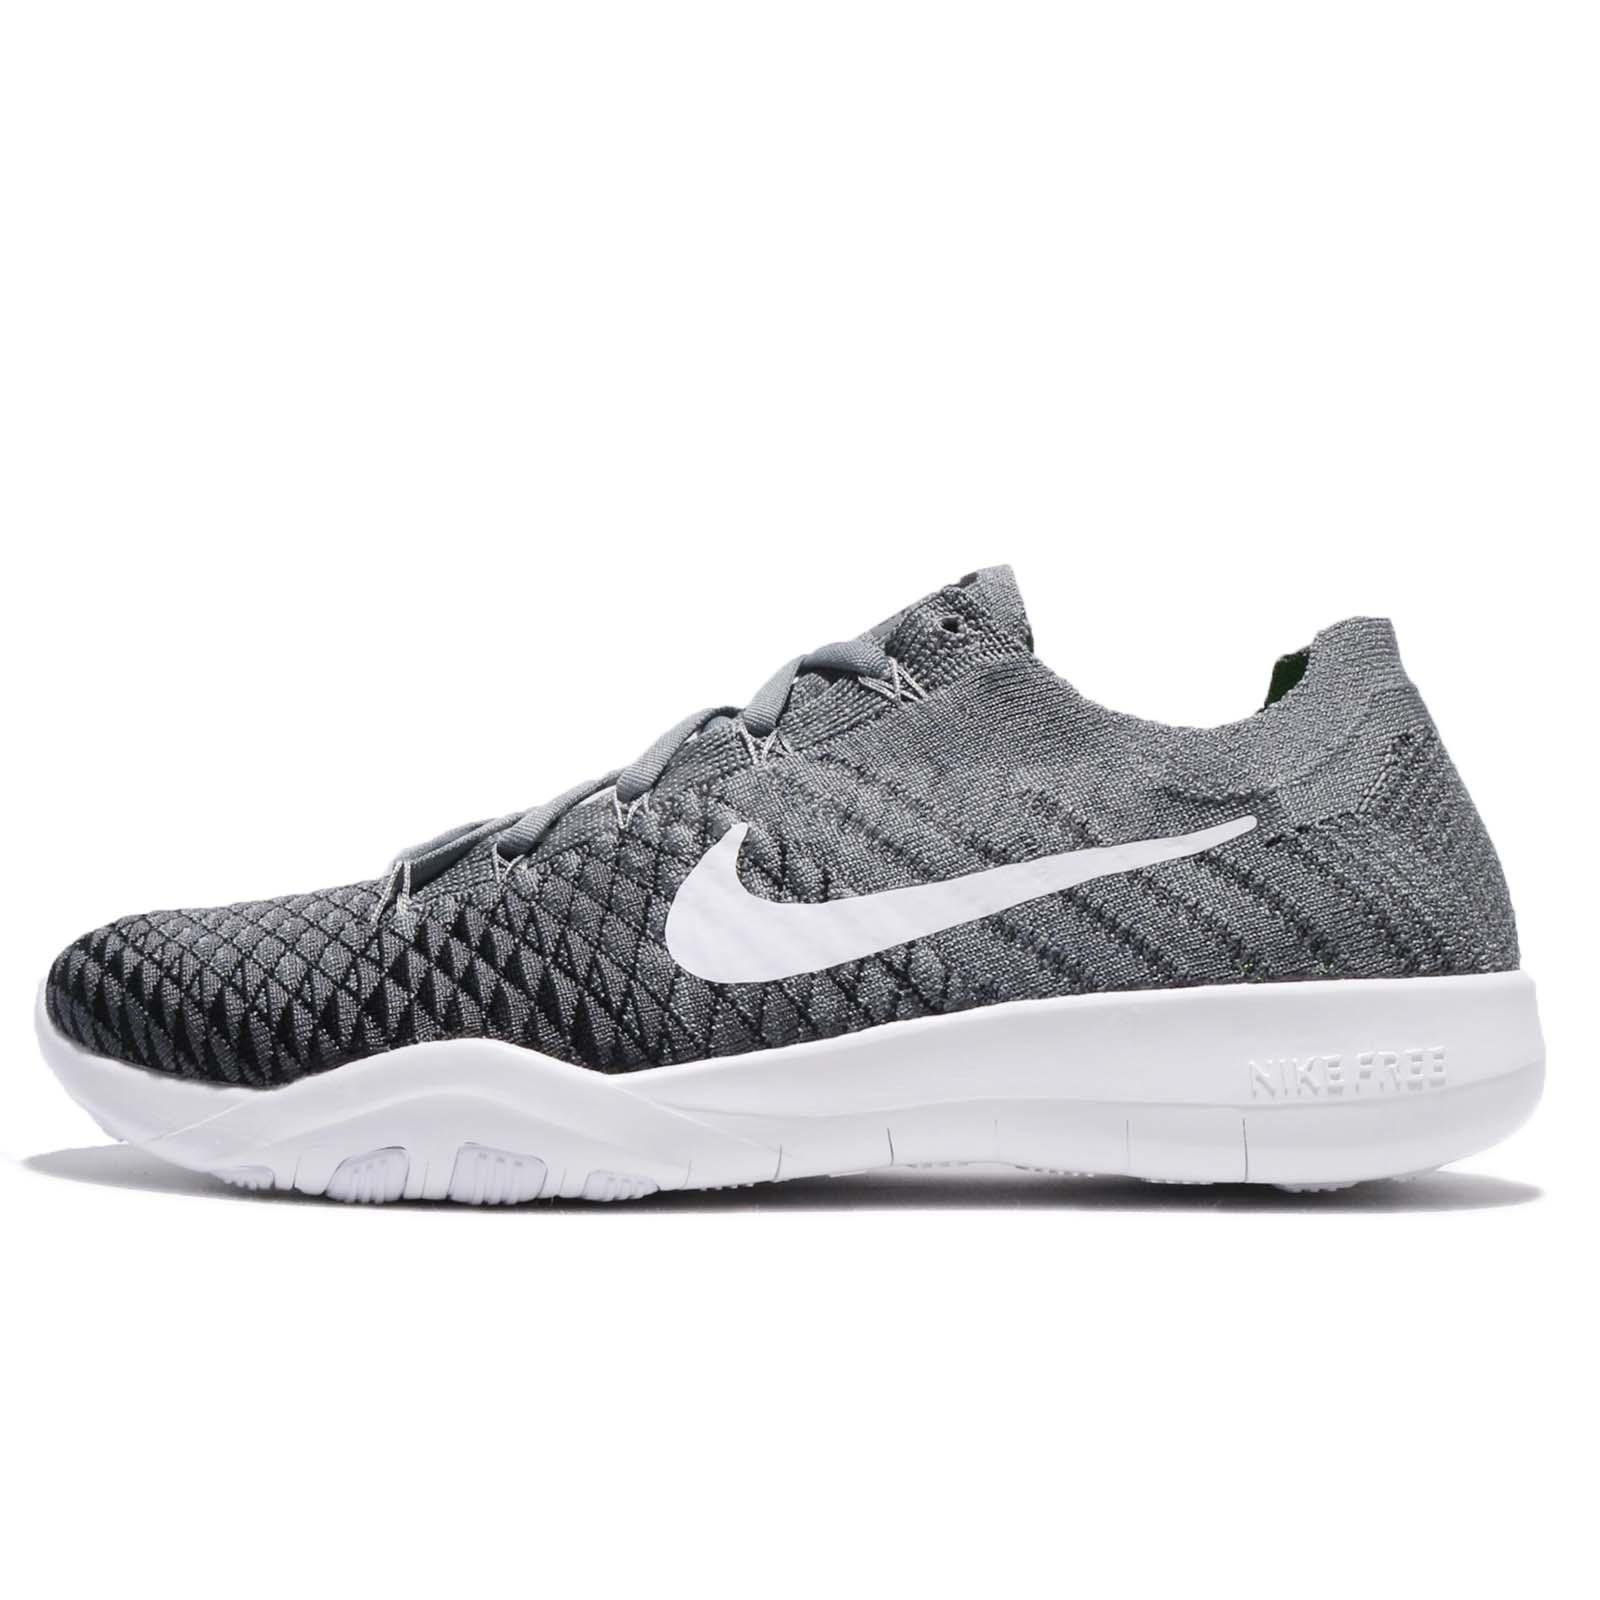 Wmns Nike Free TR Flyknit 2 II Grey White Black Women Training Shoes 904658007